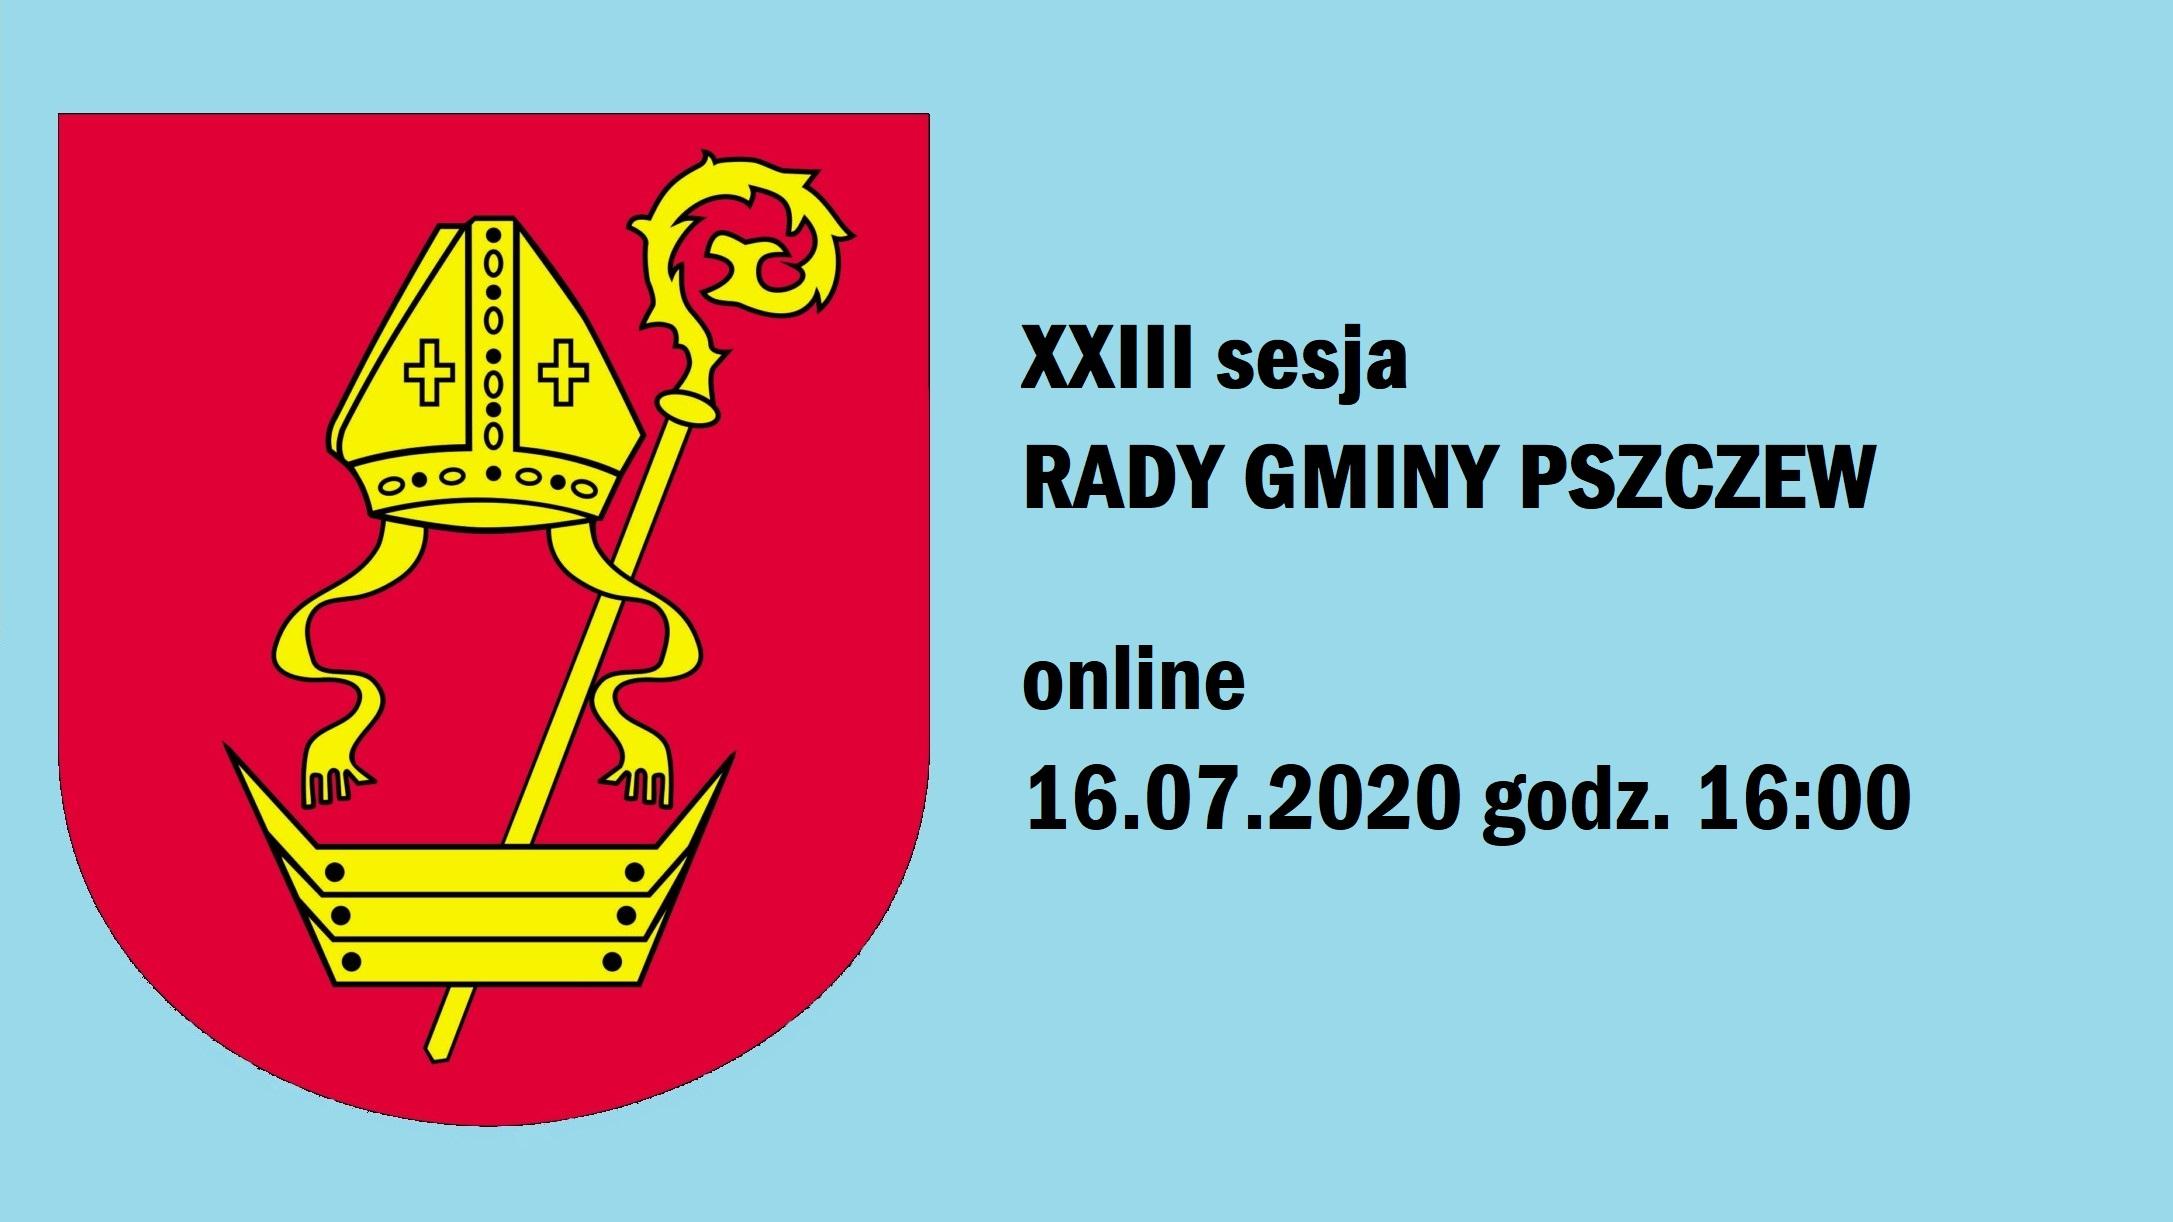 SESJA RG PSZCZEW online 16:00